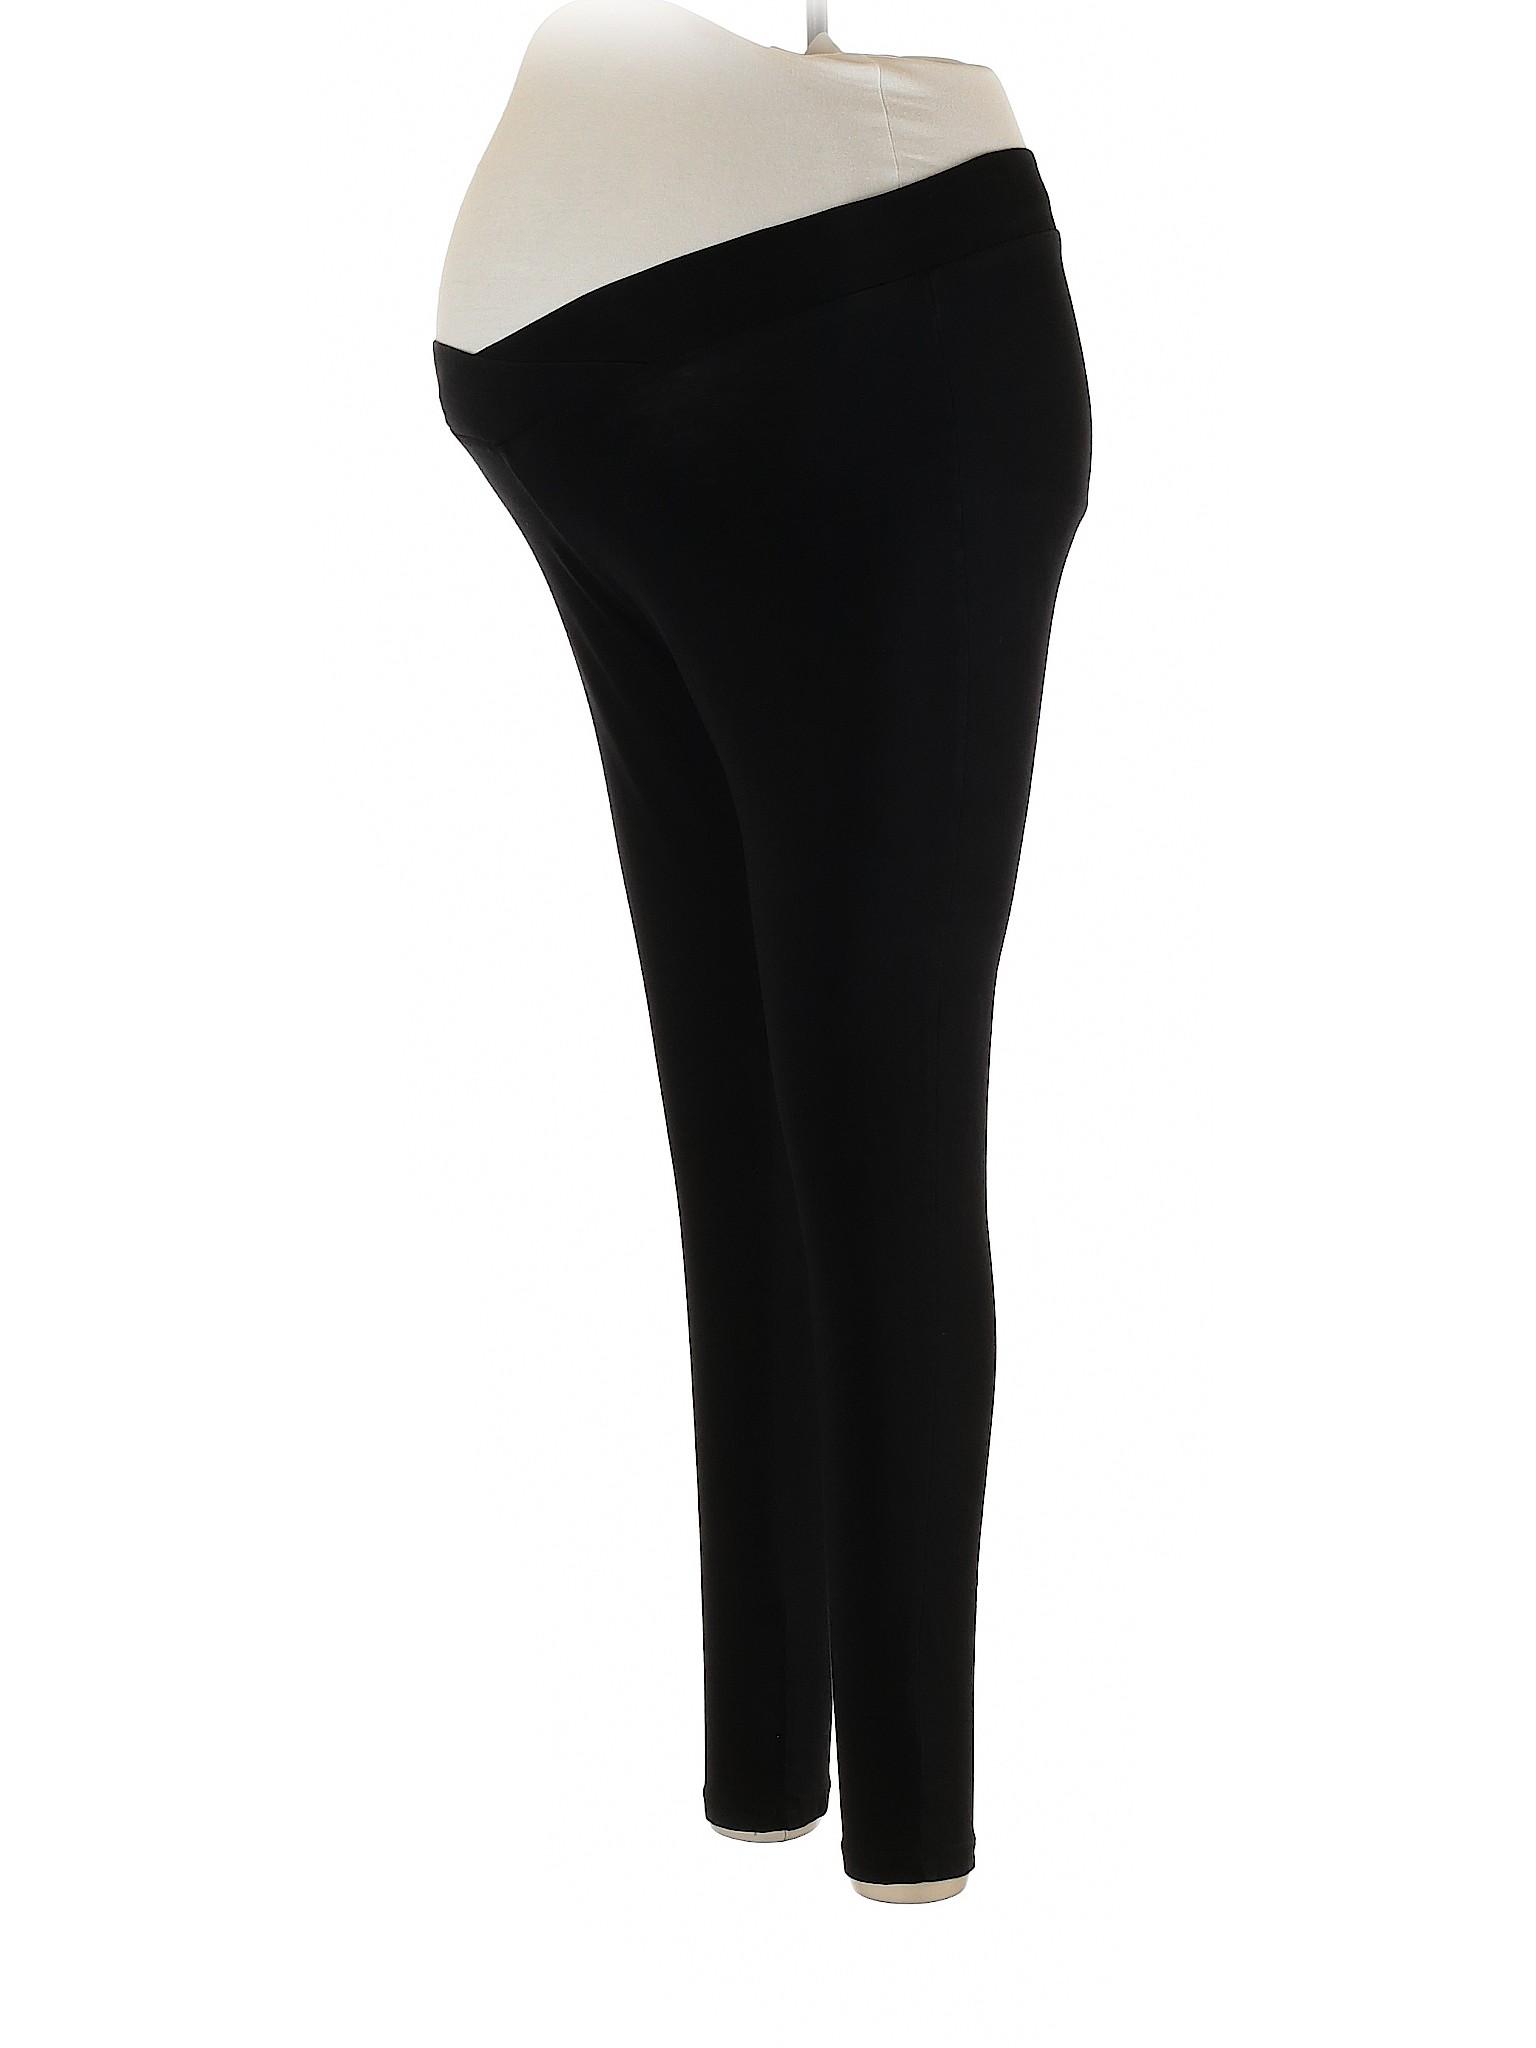 300bfaa4d7bf41 BumpStart Solid Black Leggings Size M (Maternity) - 41% off | thredUP